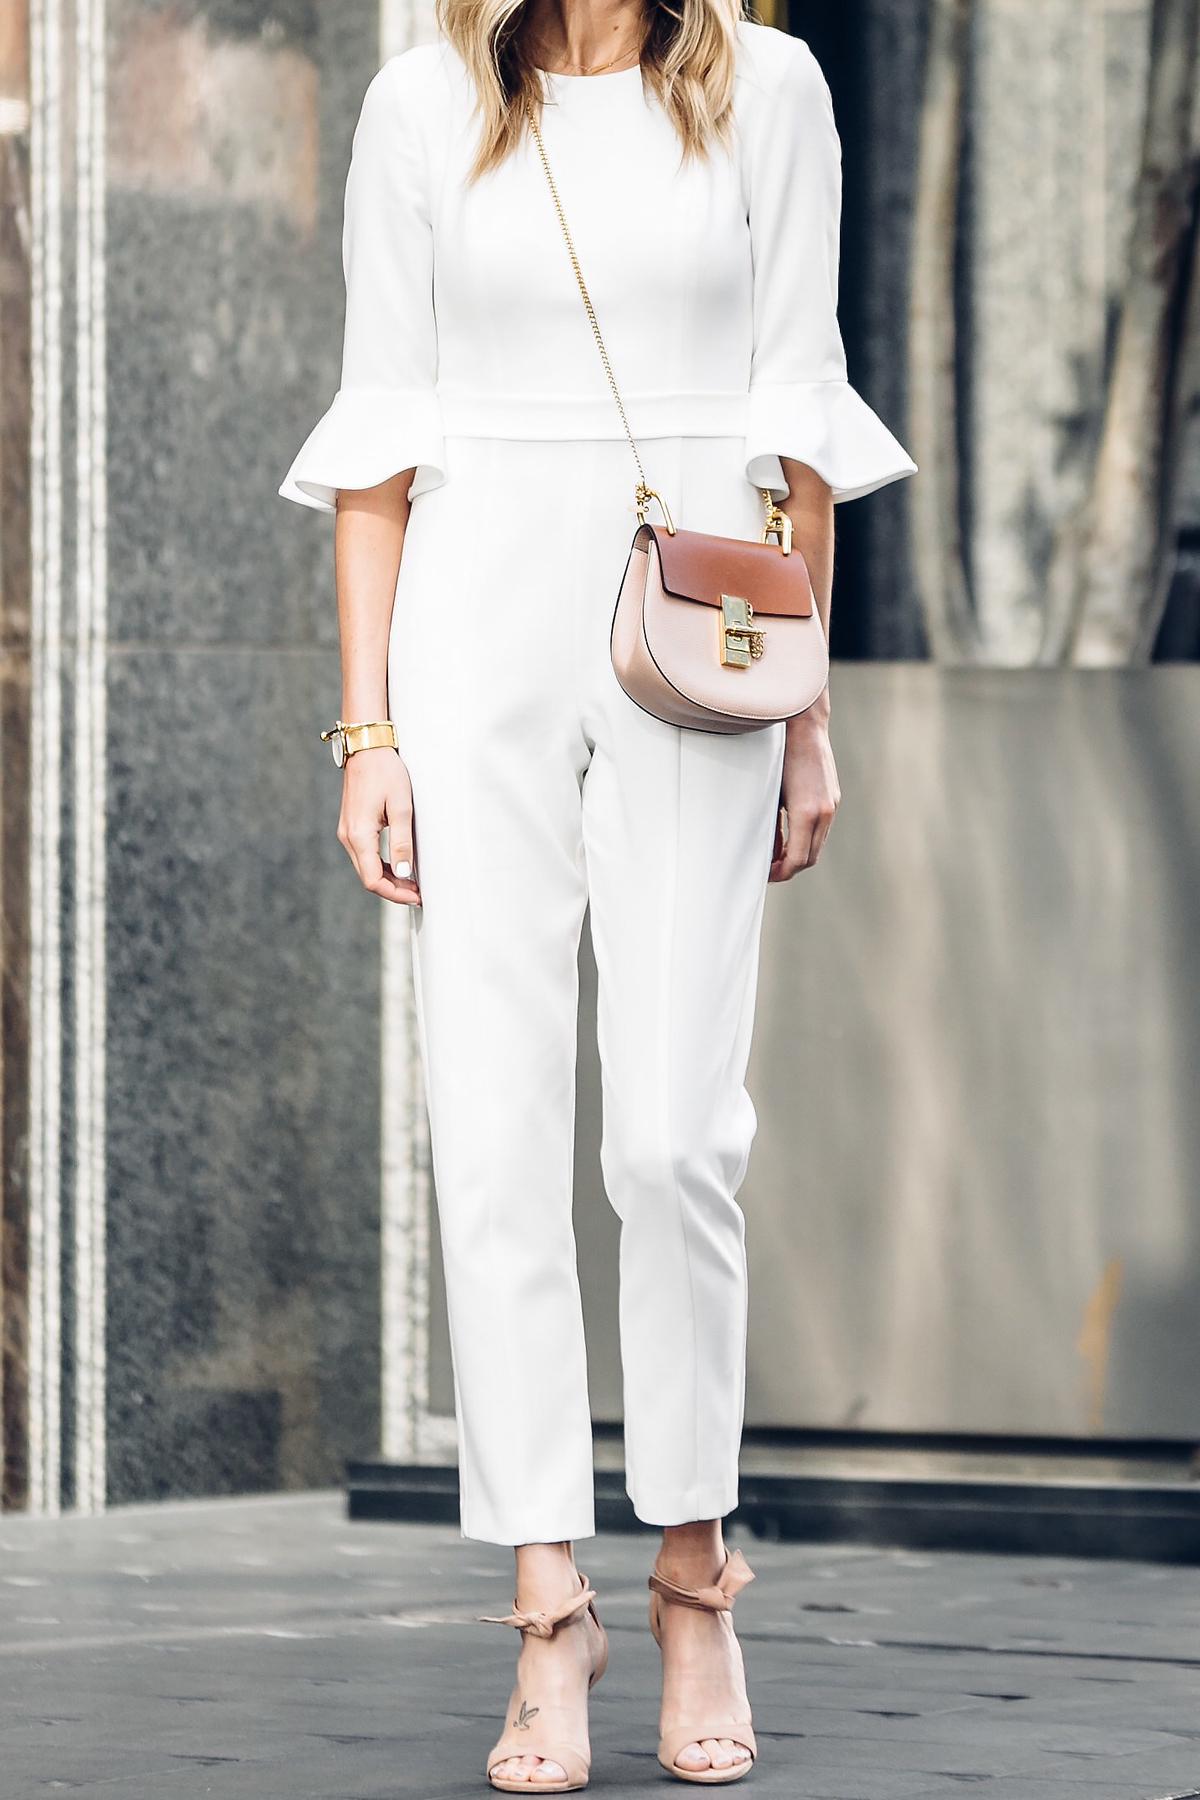 Fashion Jackson, Dallas Blogger, Fashion Blogger, Street Style, Black Halo White Jumpsuit, Chloe Drew Handbag, Tan Ankle Strap Bow Heeled Sandals